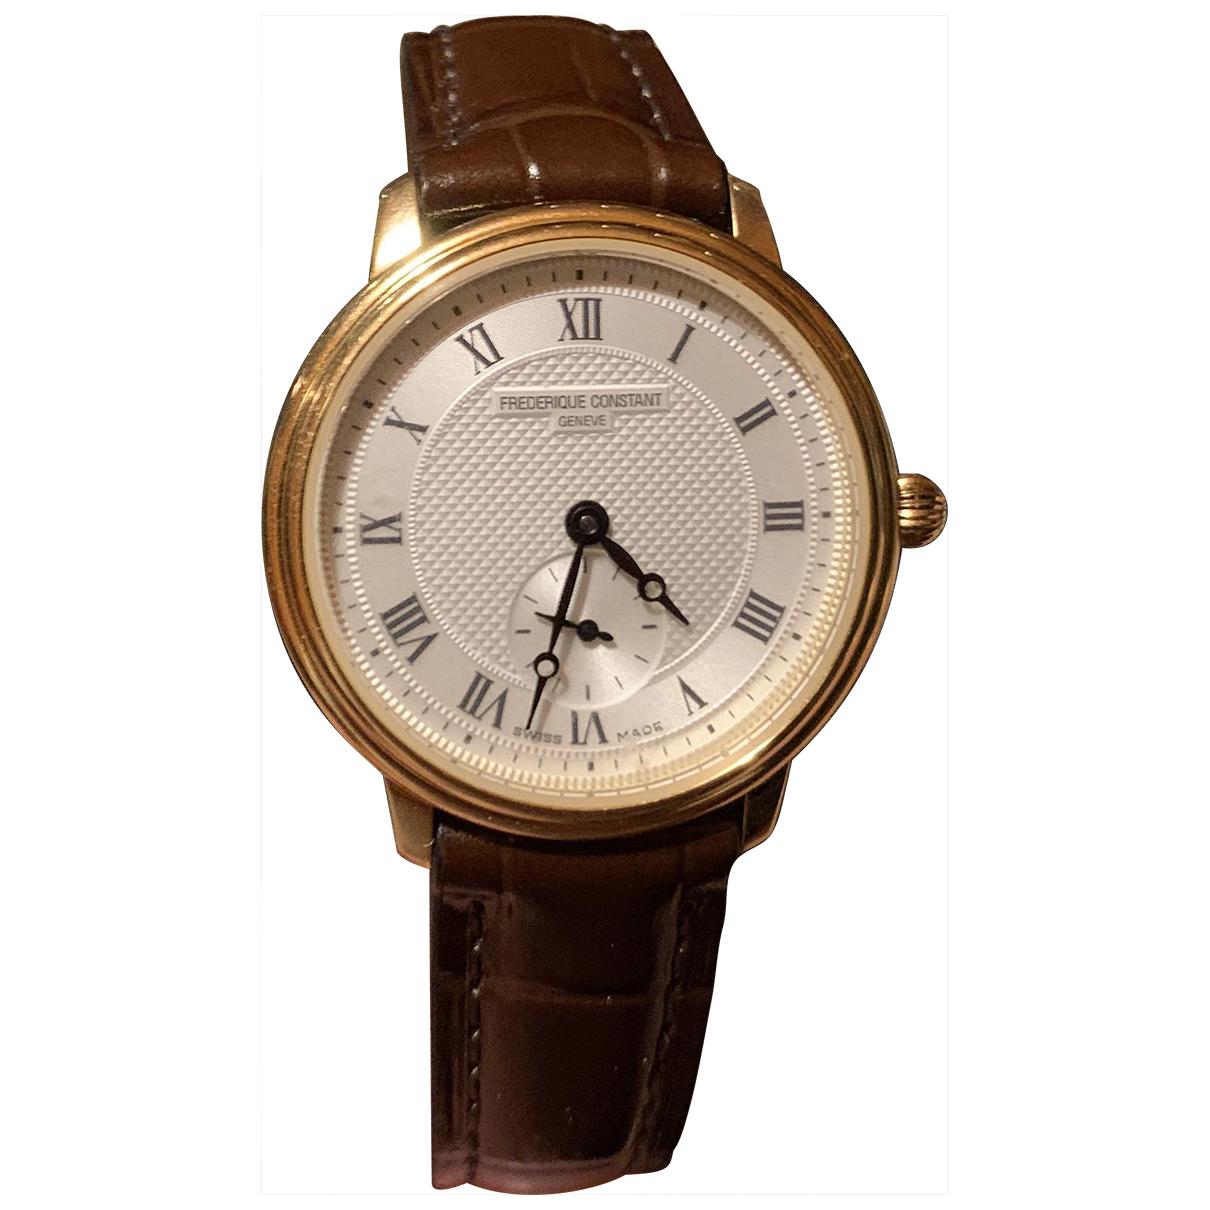 Reloj SlimLine Petit Modele Frederique Constant